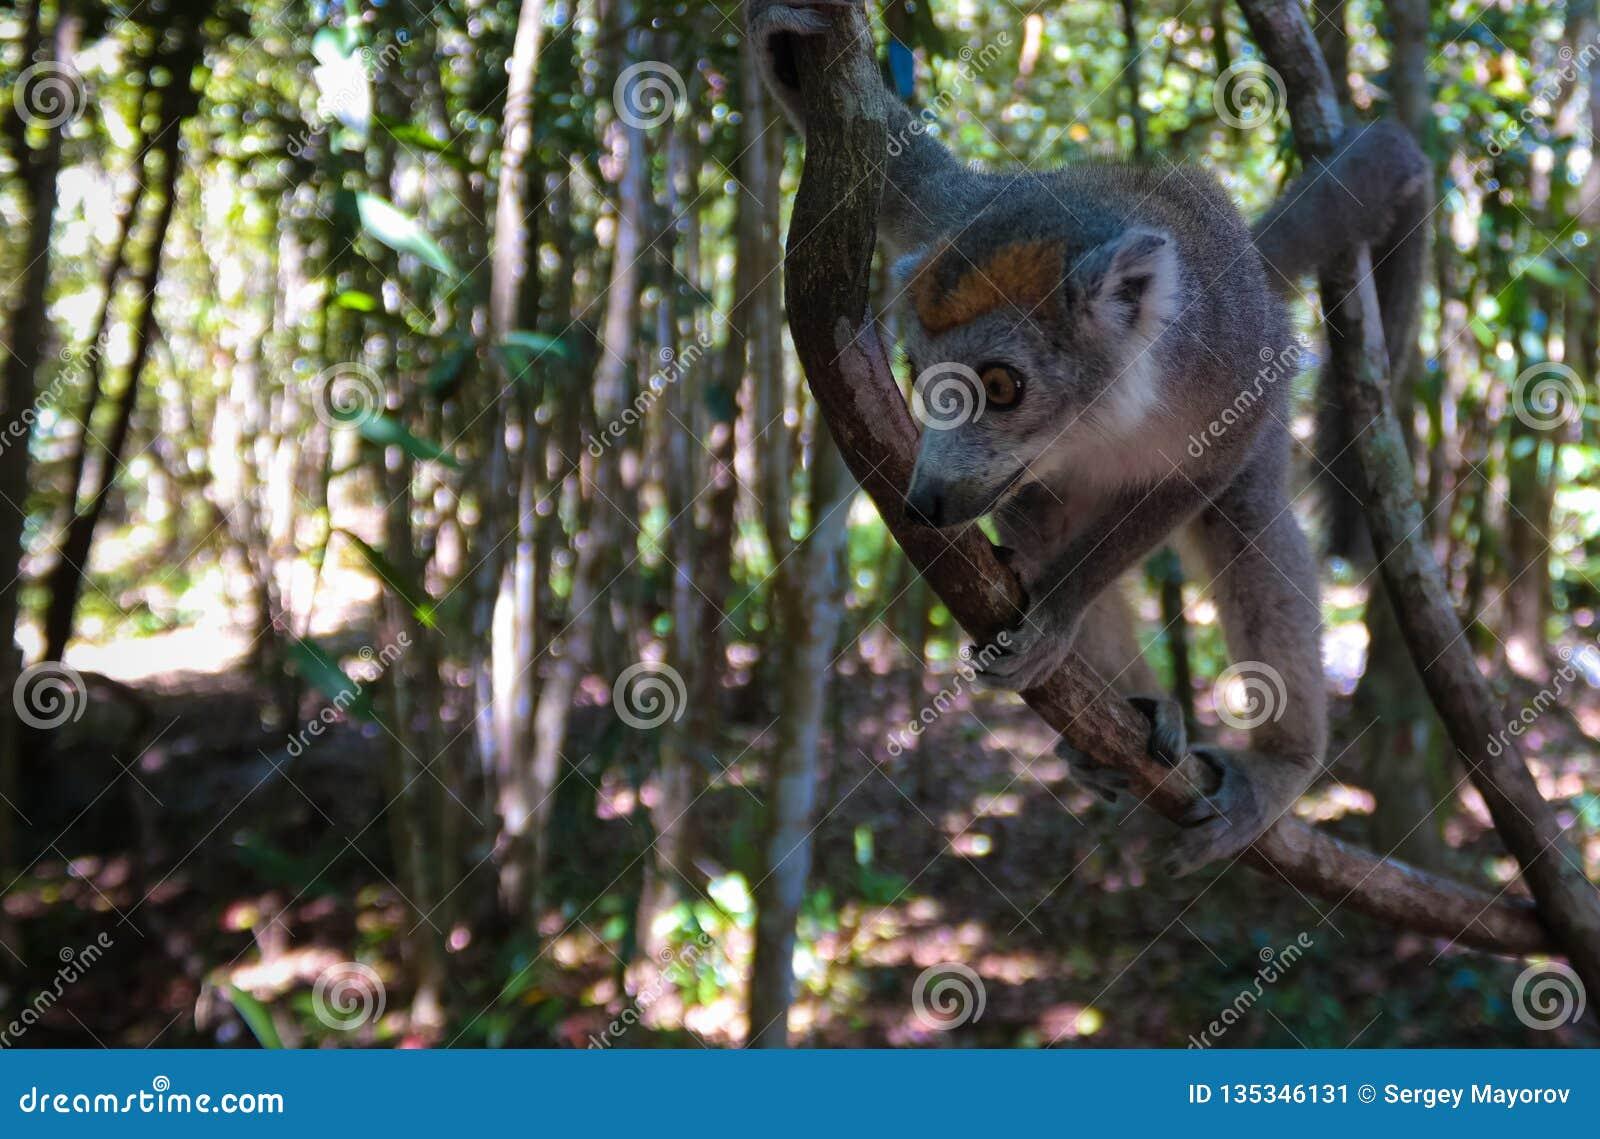 Portret koronowany lemur przy drzewem, Atsinanana region, Madagascar